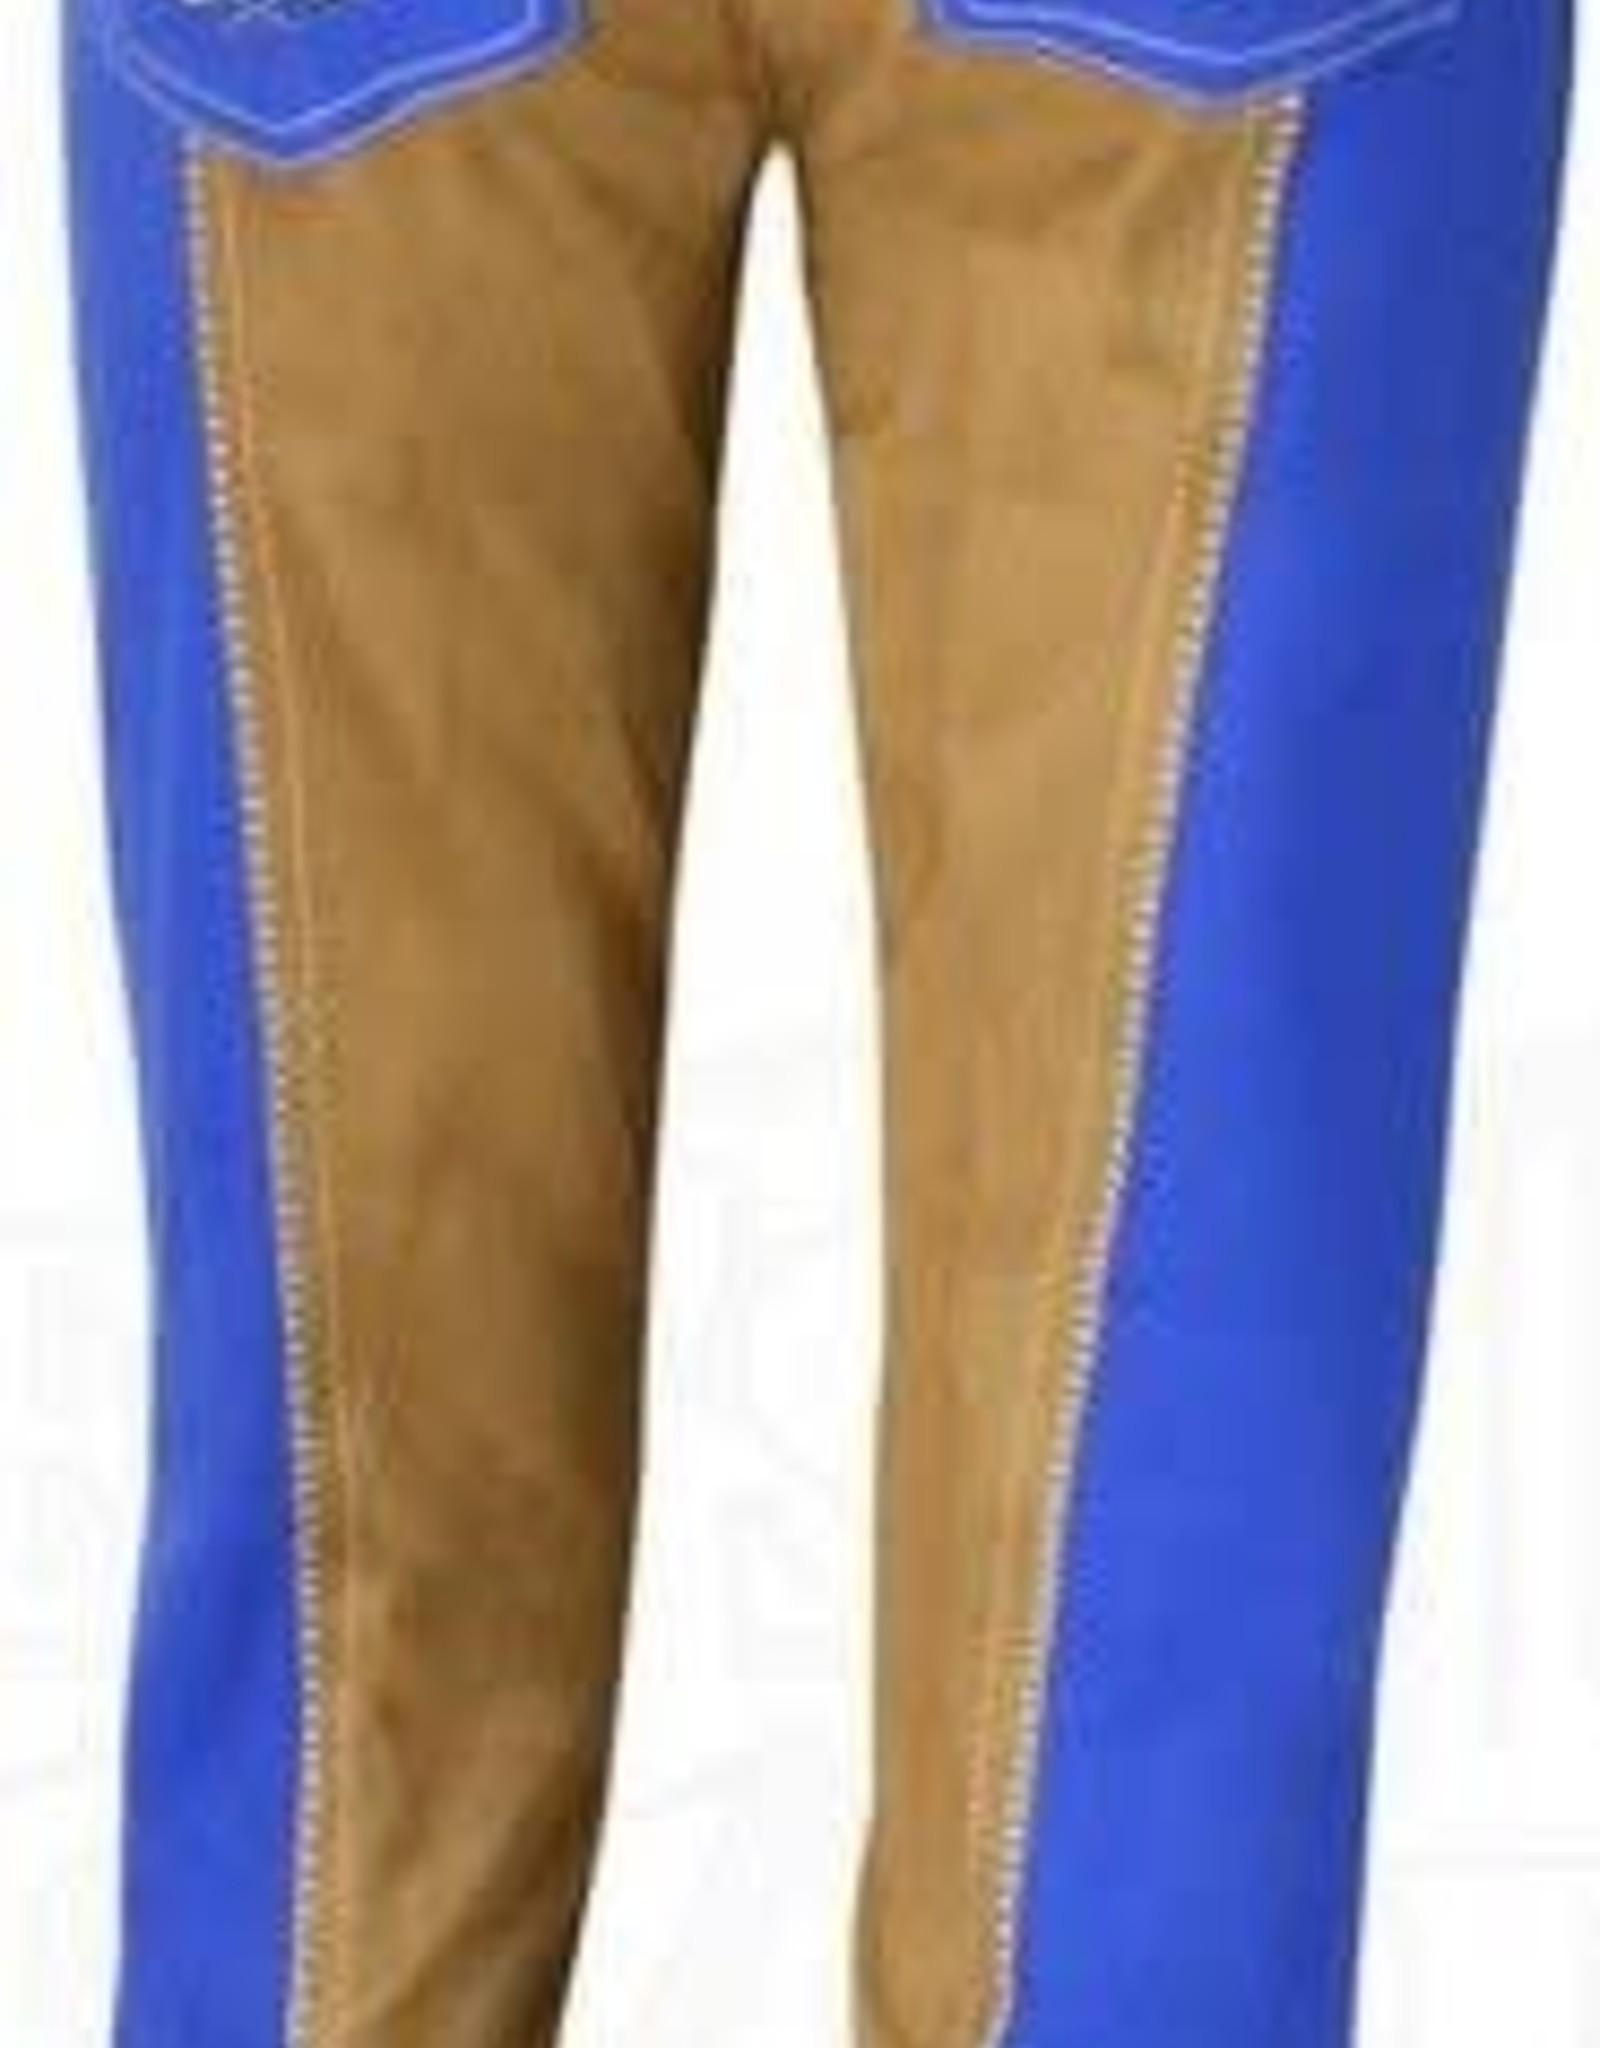 Thomas Cook Thomas Cook Cougar Breech - Dazzling Blue - Size 14